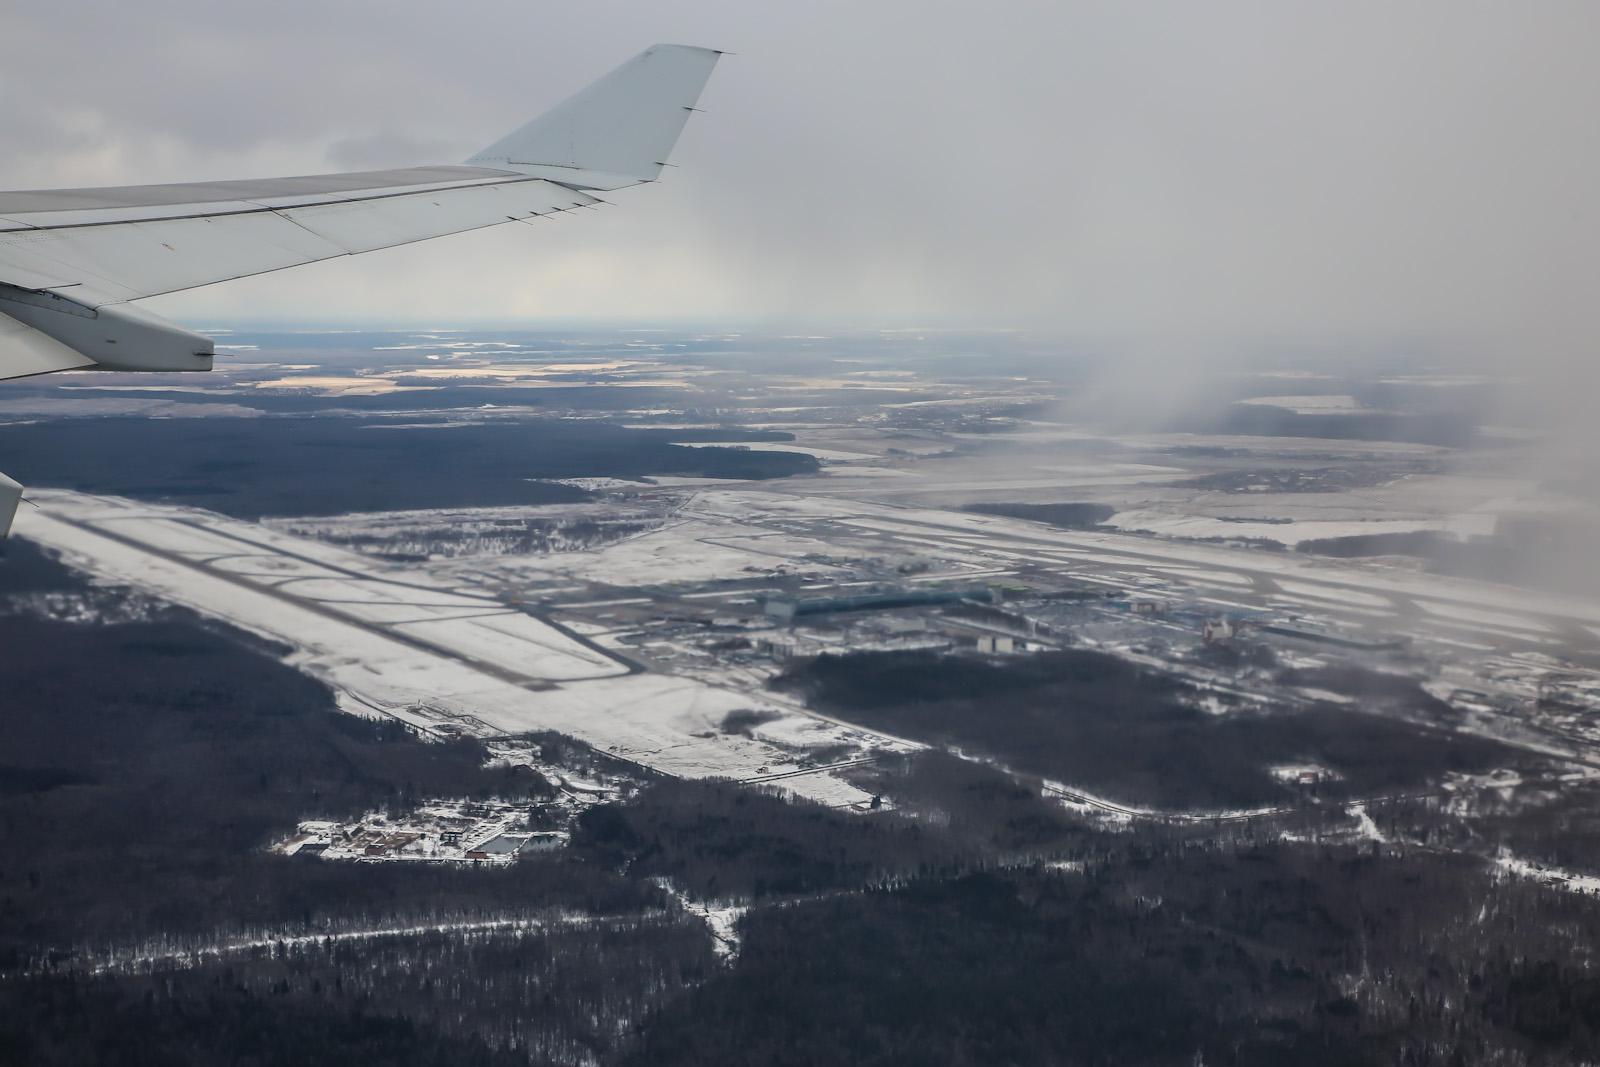 Вид на аэропорт Домодедово из самолета